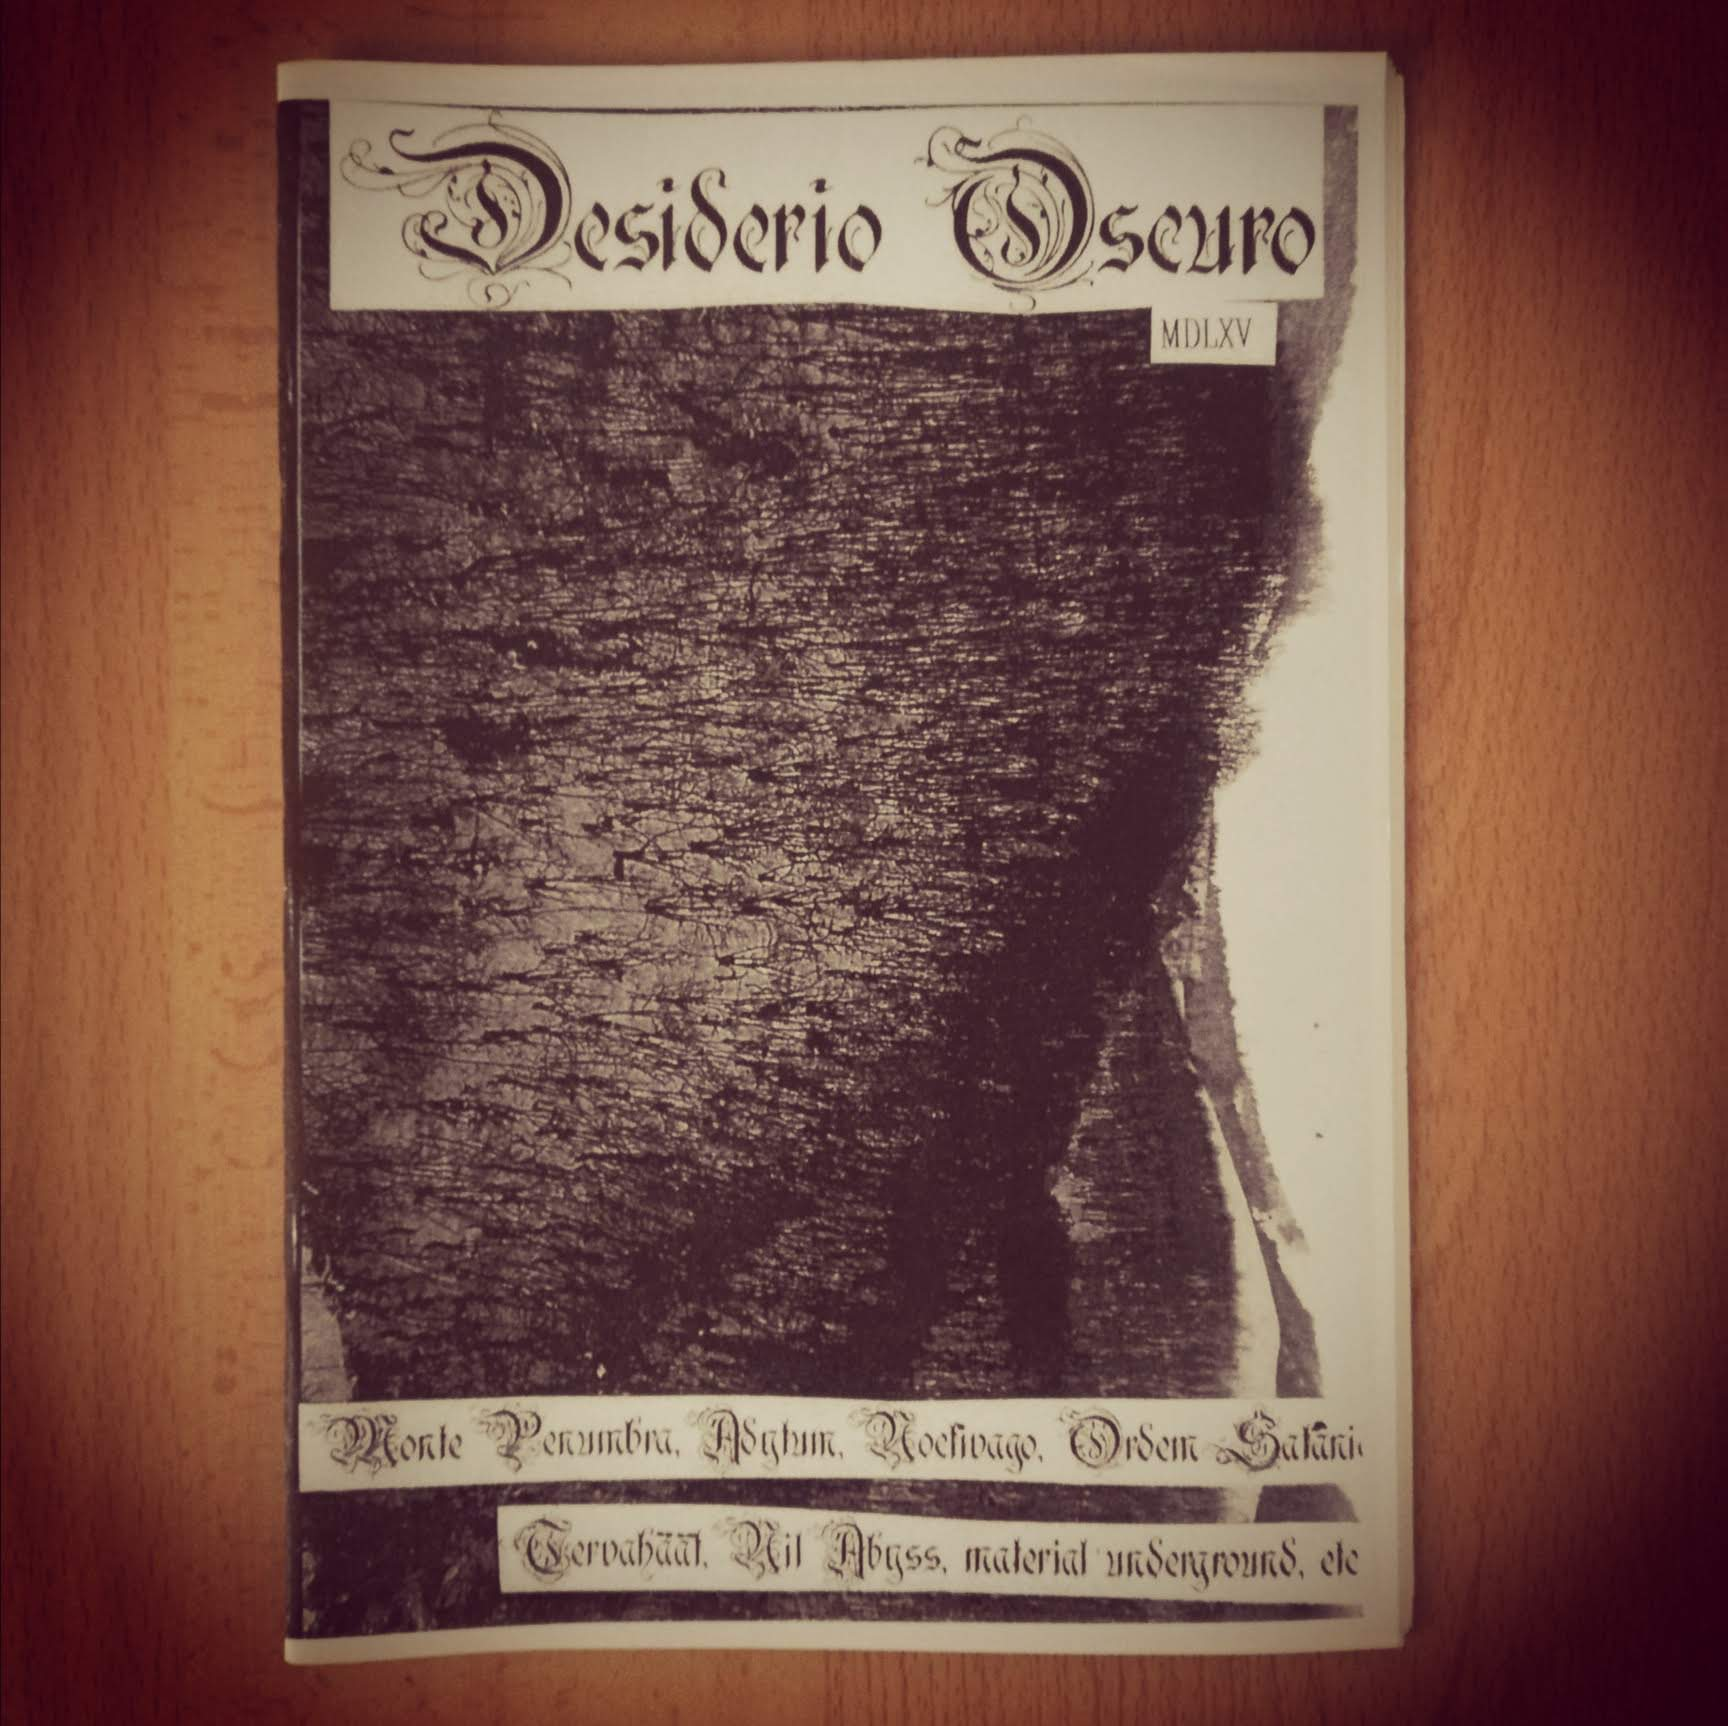 DESIDERIO OSCURO # MDLXV